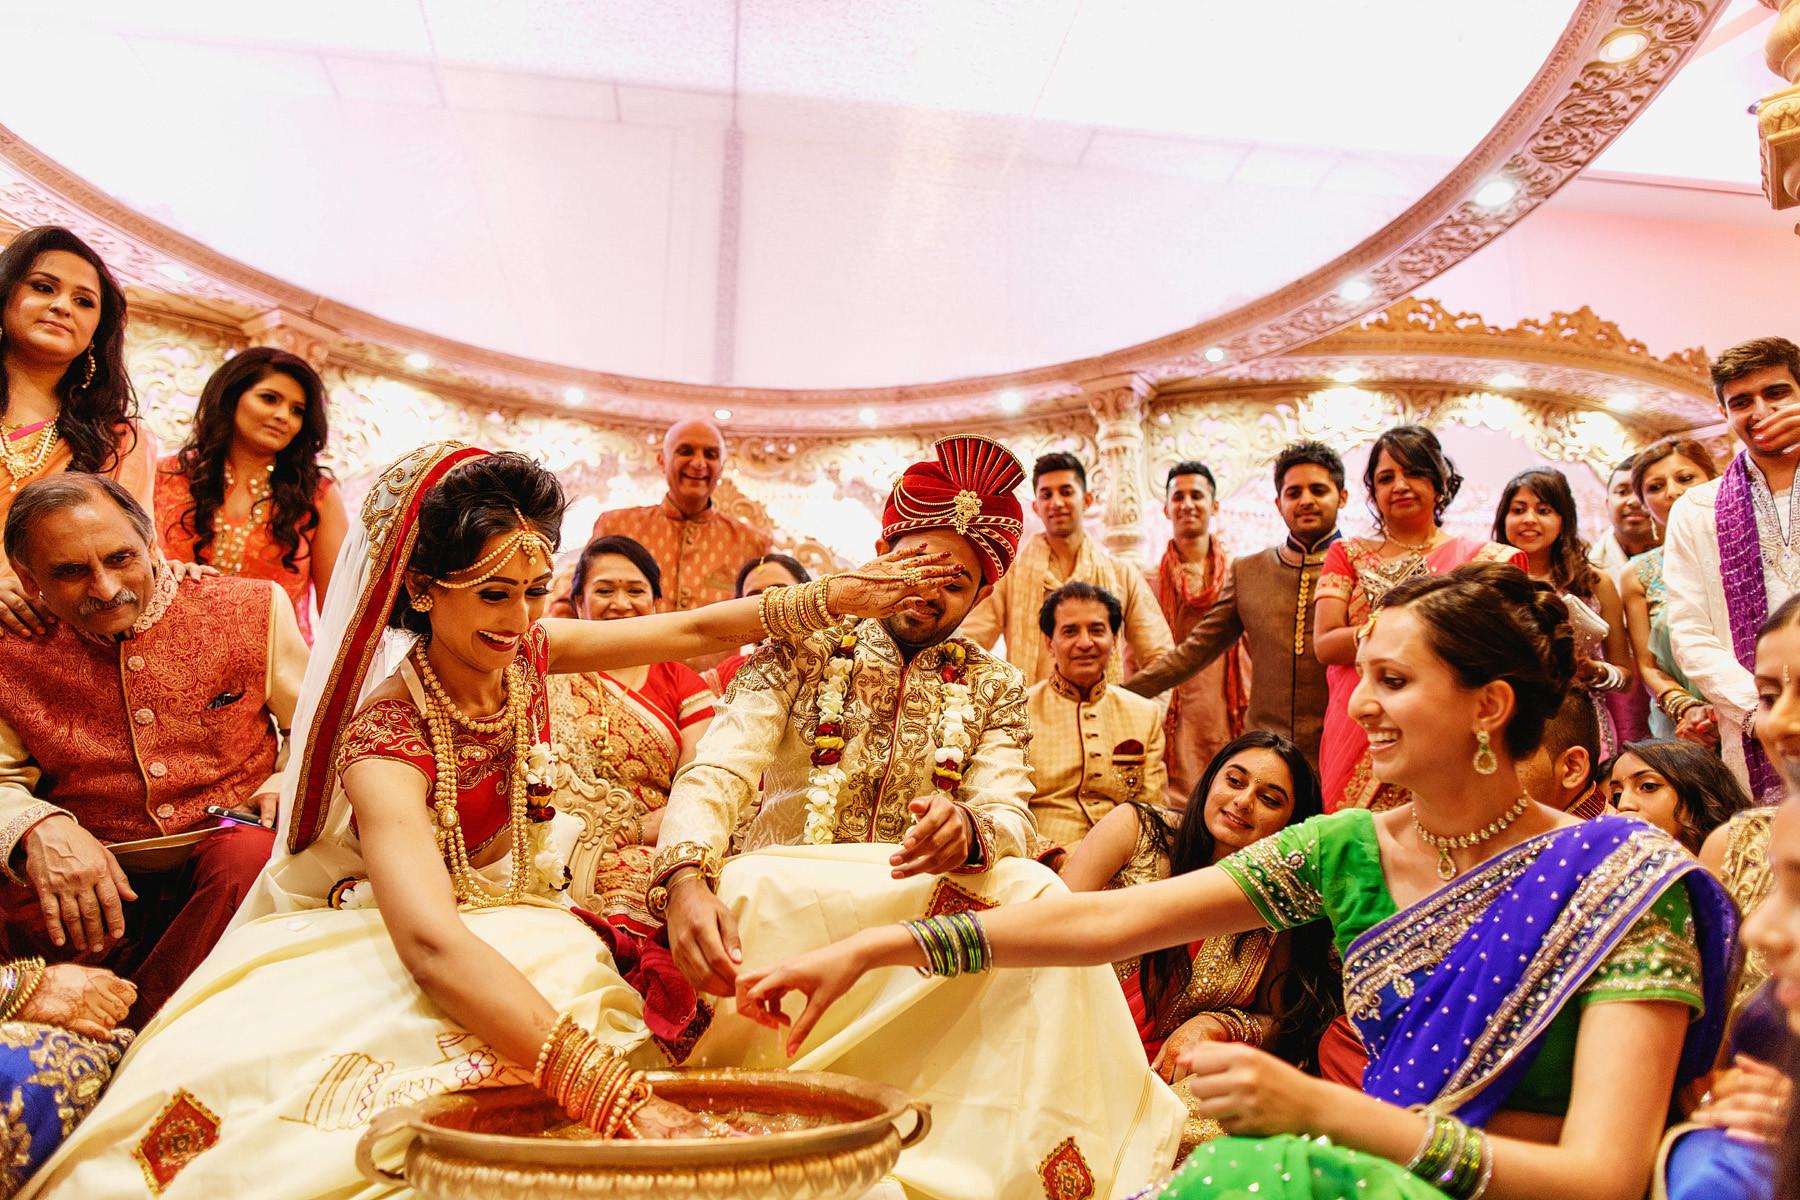 Londons Best Venues For Asian Weddings